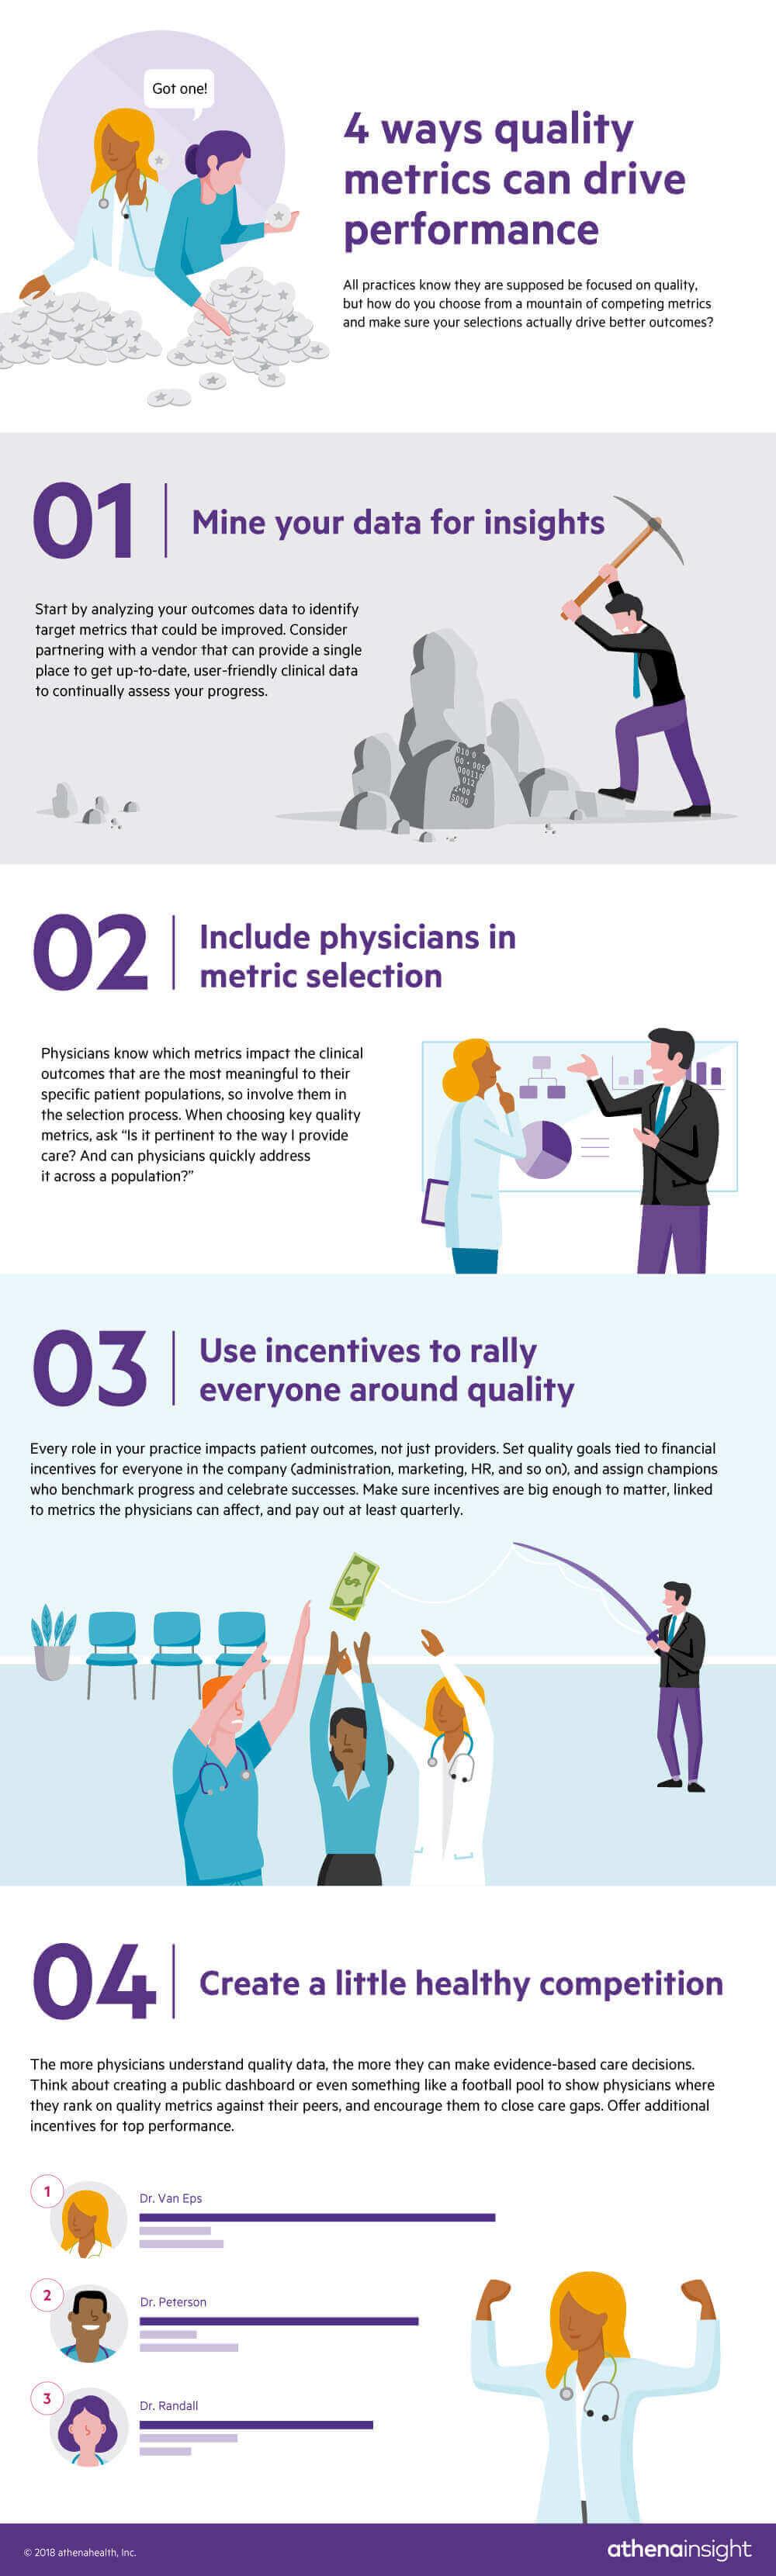 infographic: 4 ways quality metrics can drive performance